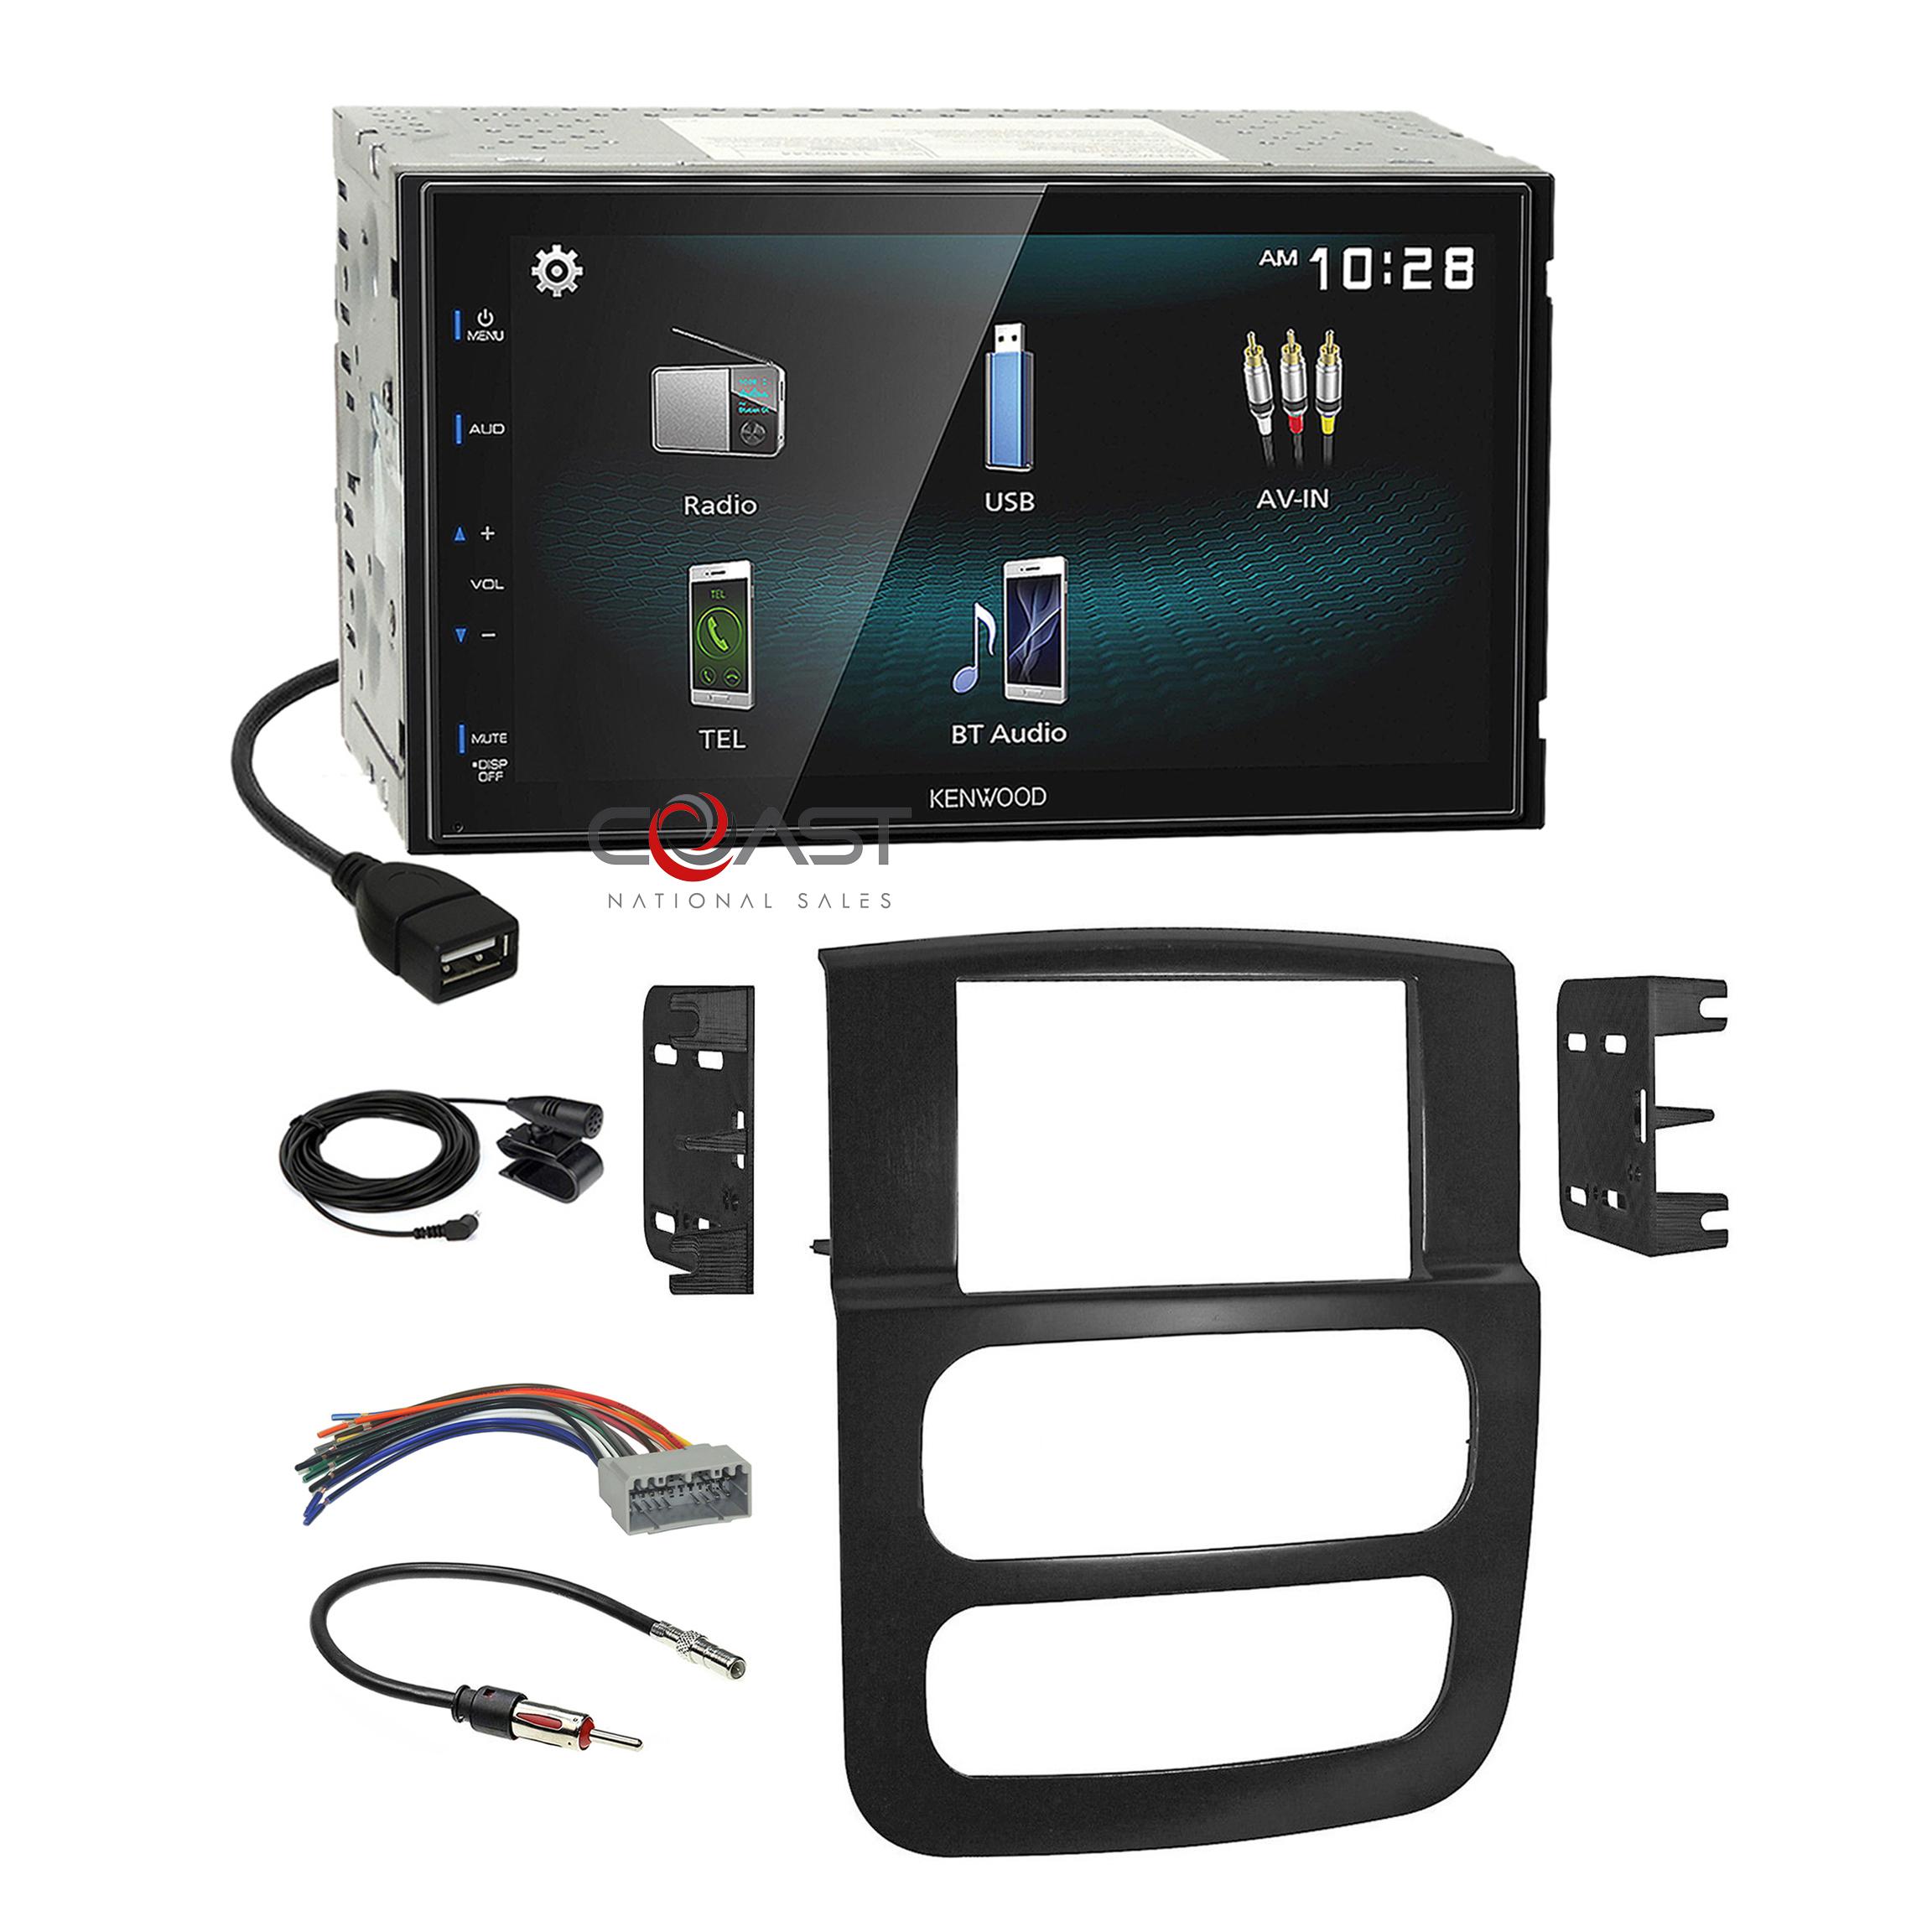 Kenwood Smartphone Android Mirror Stereo Dash Kit Harness for 02-05 Dodge  Ram | eBayeBay